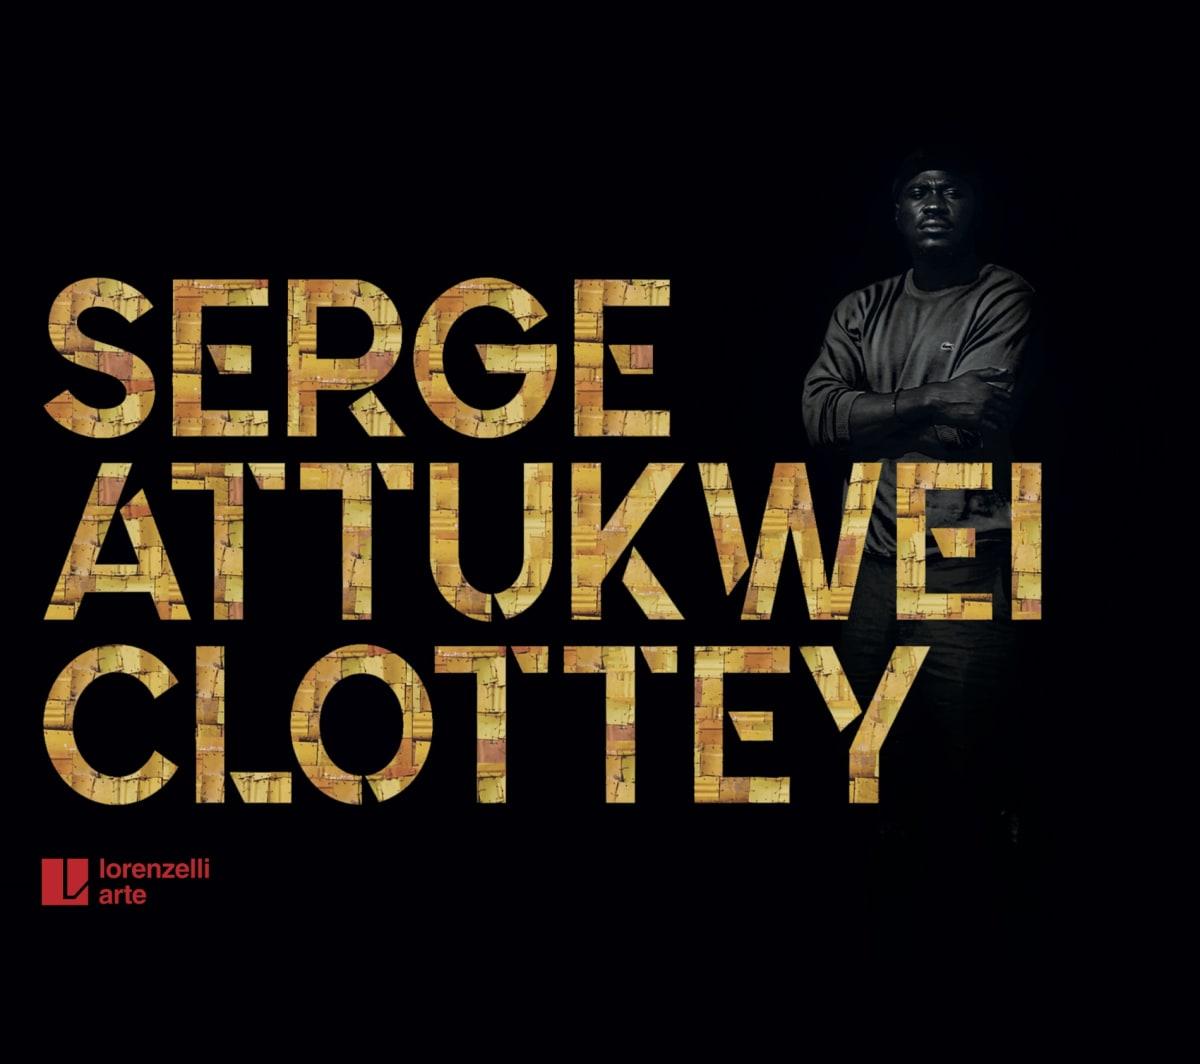 Serge Attukwei Clottey